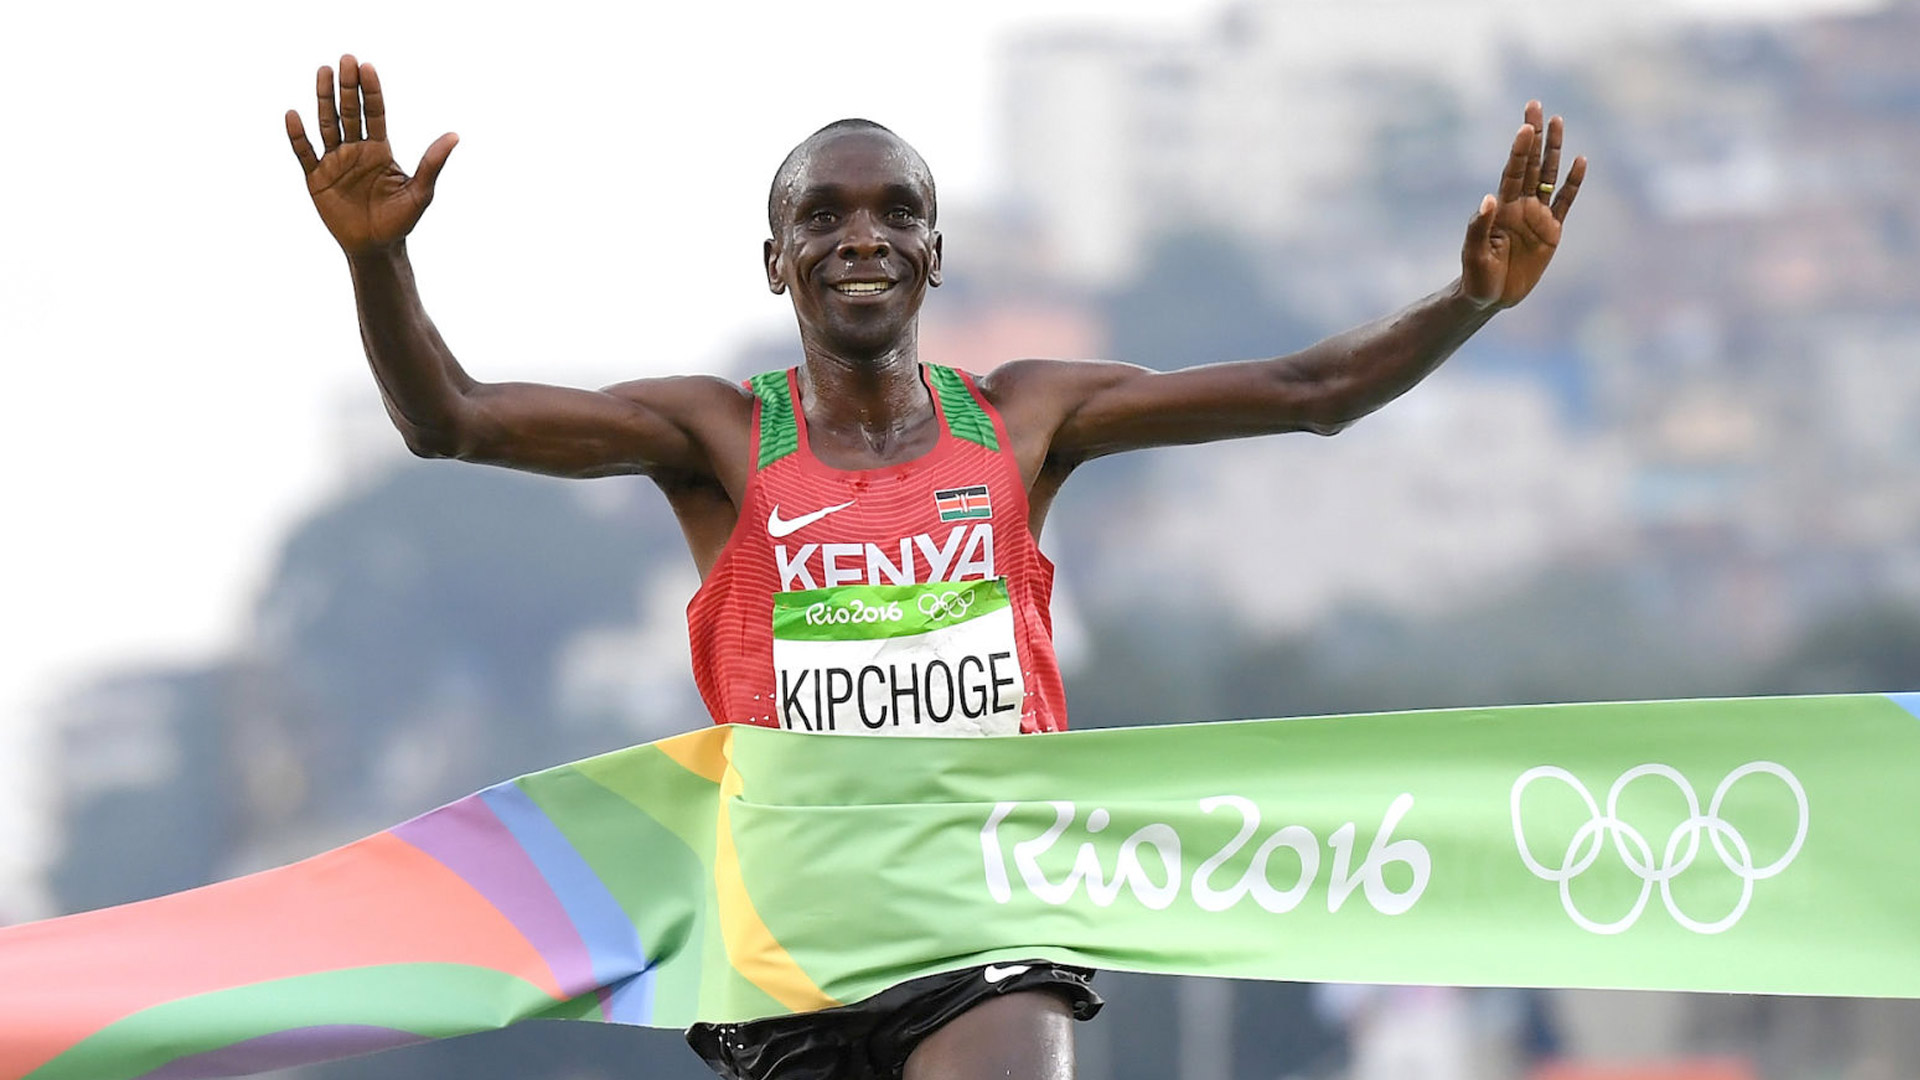 maratonista queniano Eliud Kipchoge